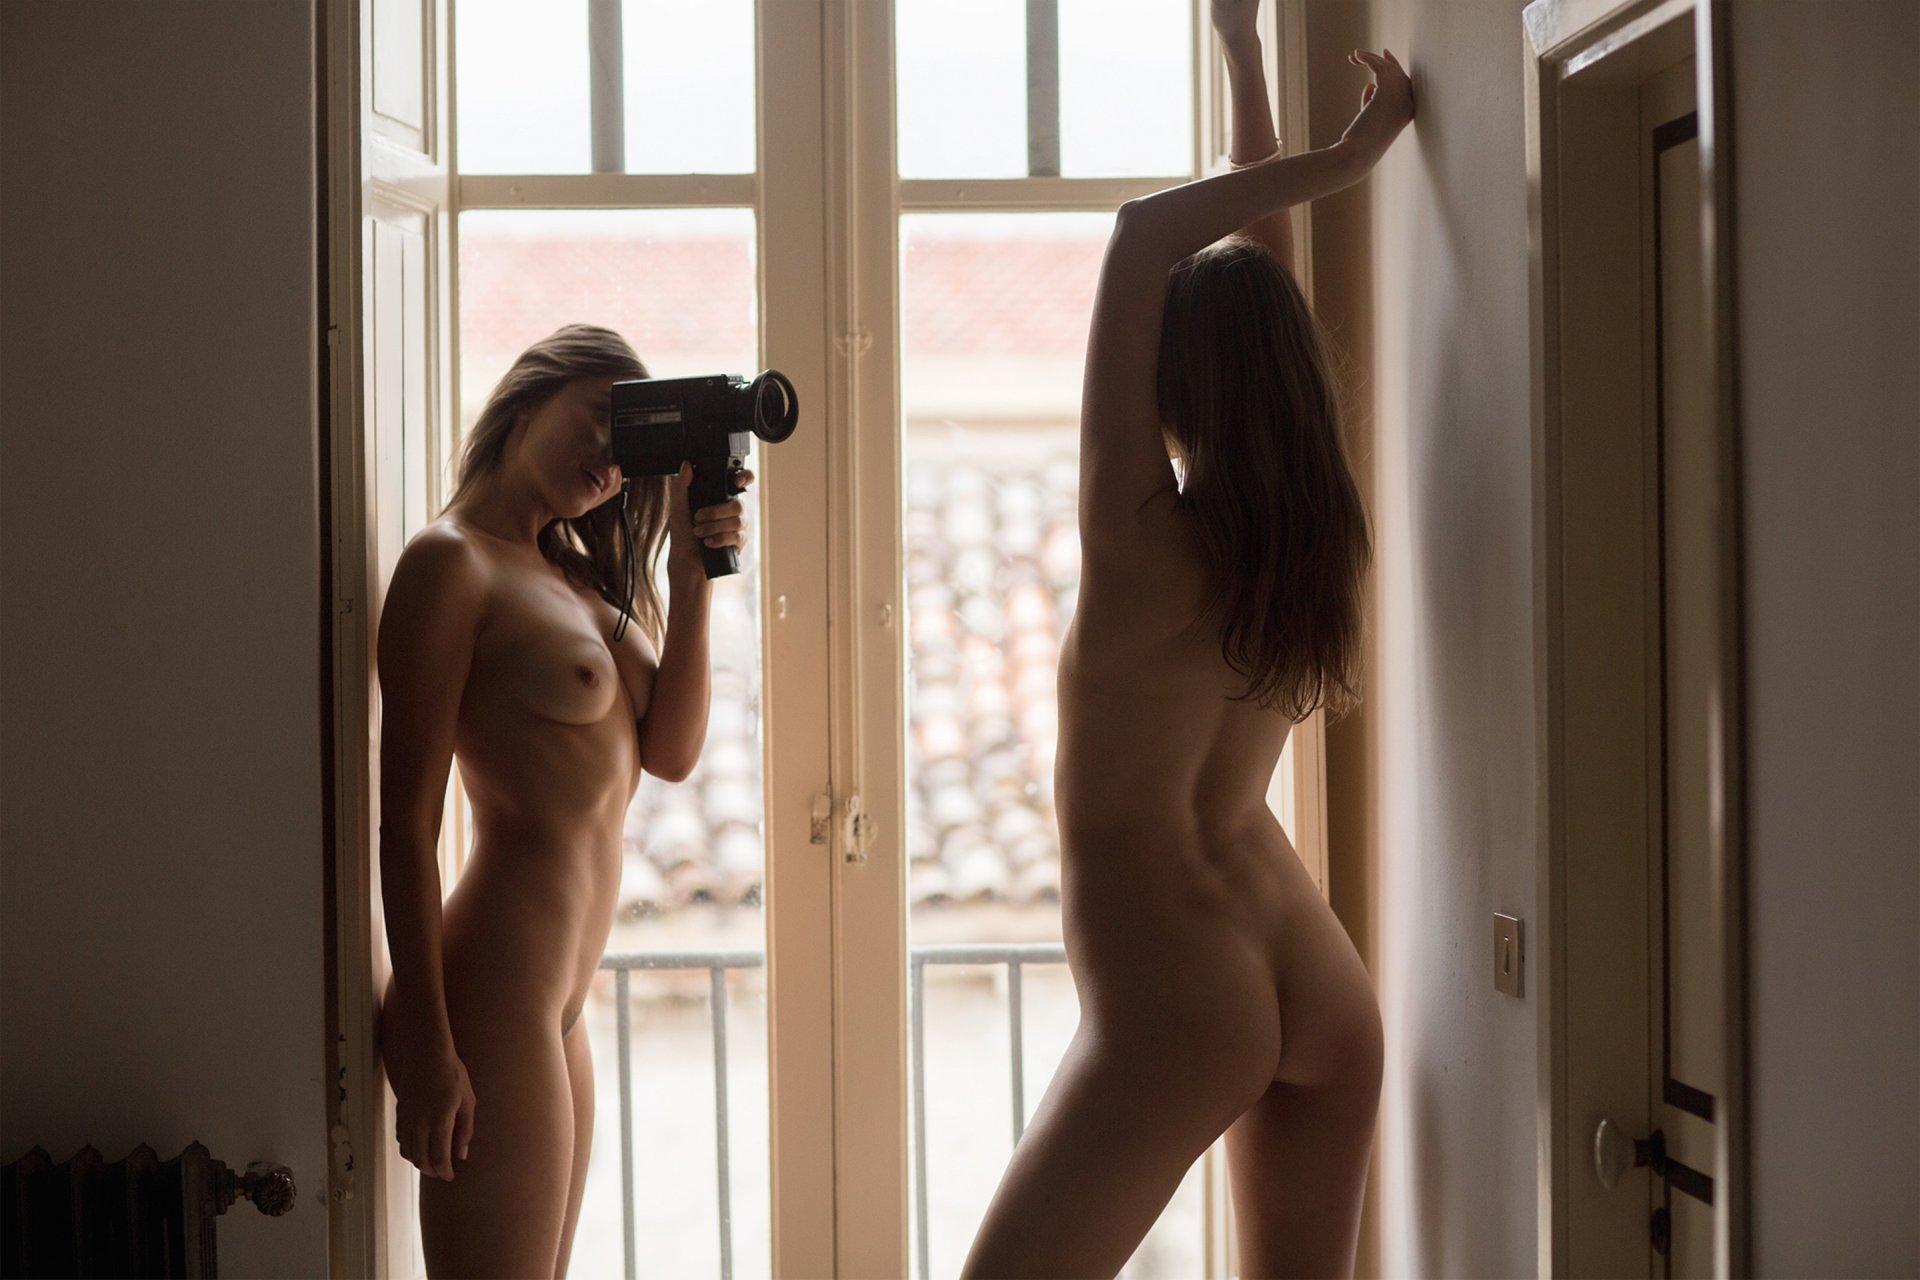 Naked pictures of brooke hogan